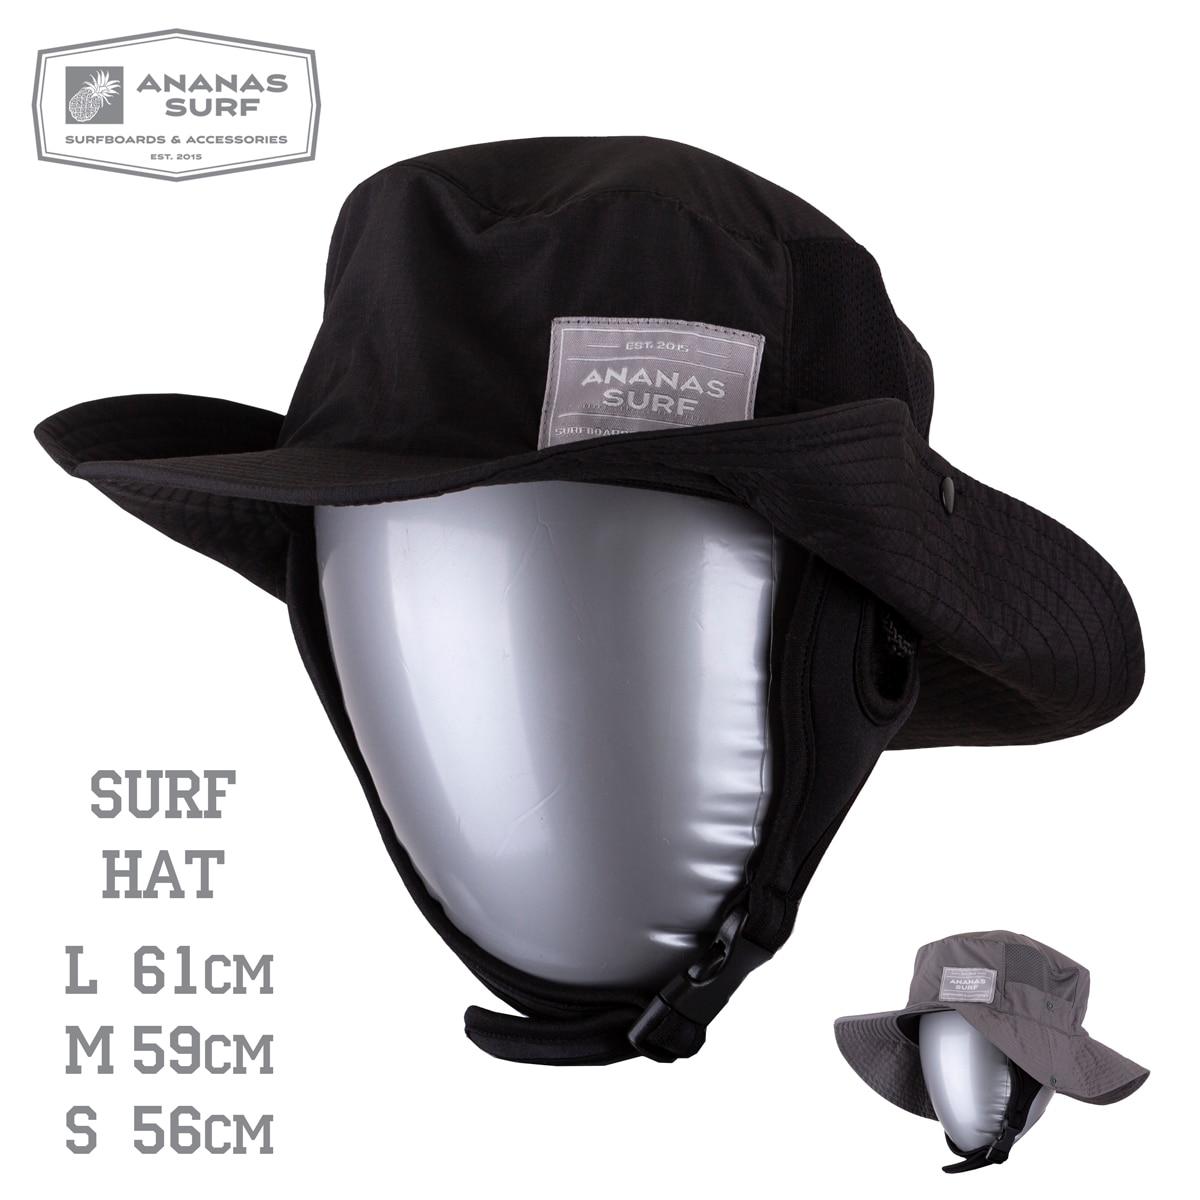 Ananas Surf indo surfing backet hat with strap kitesurf surf cap fisherman water sport sun hats men women boy girl unisex